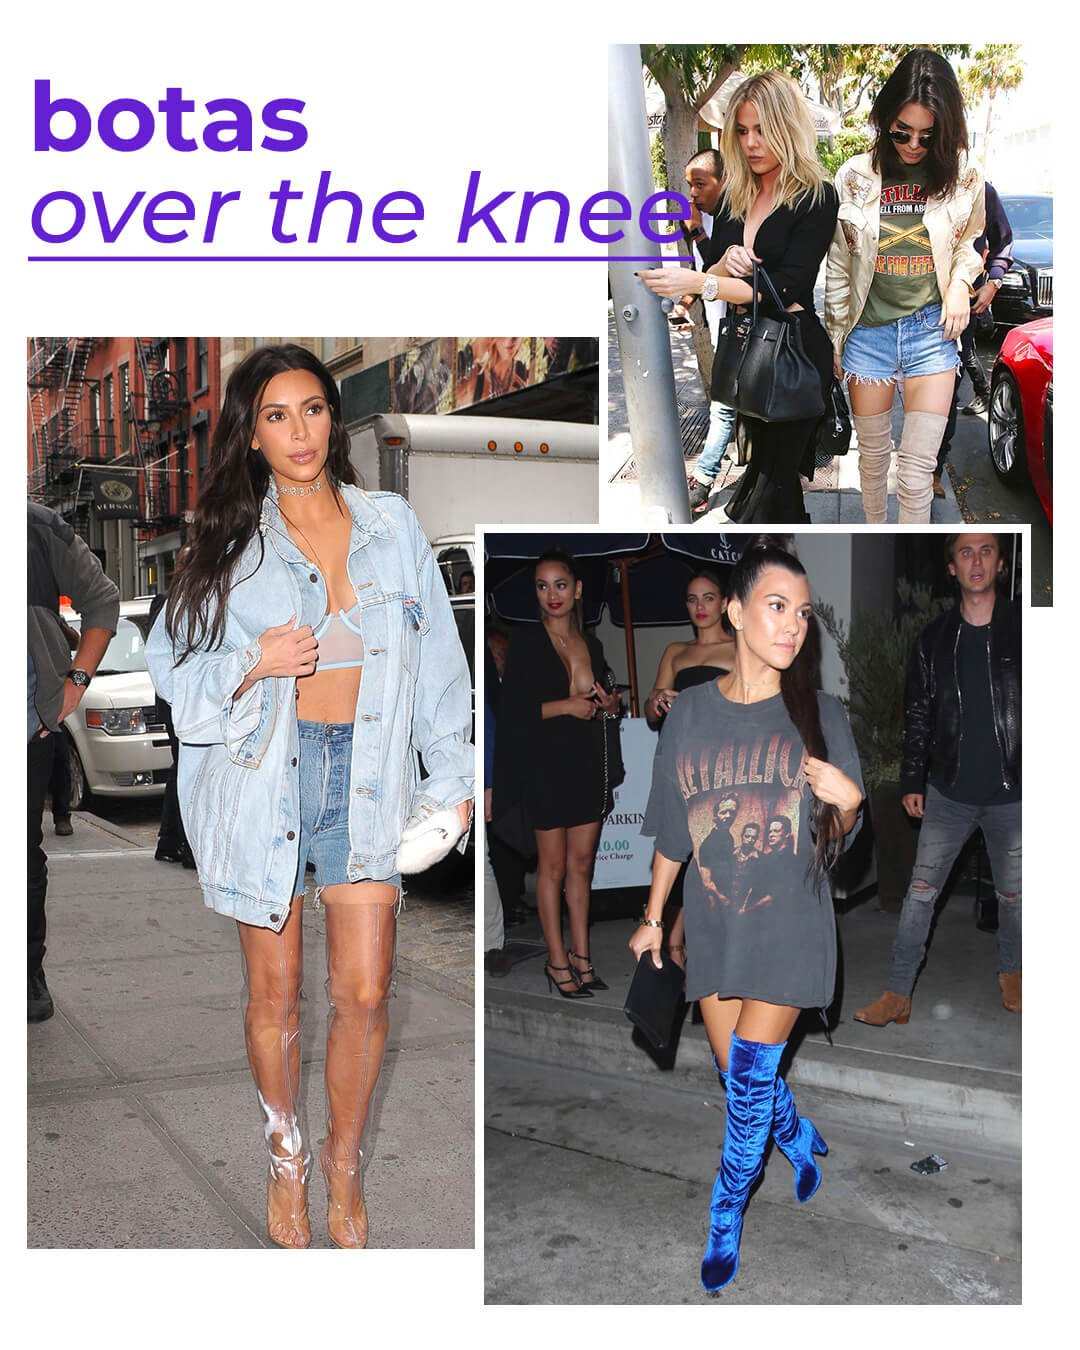 It girls - Botas - Kardashians - Verão - Street Style - https://stealthelook.com.br